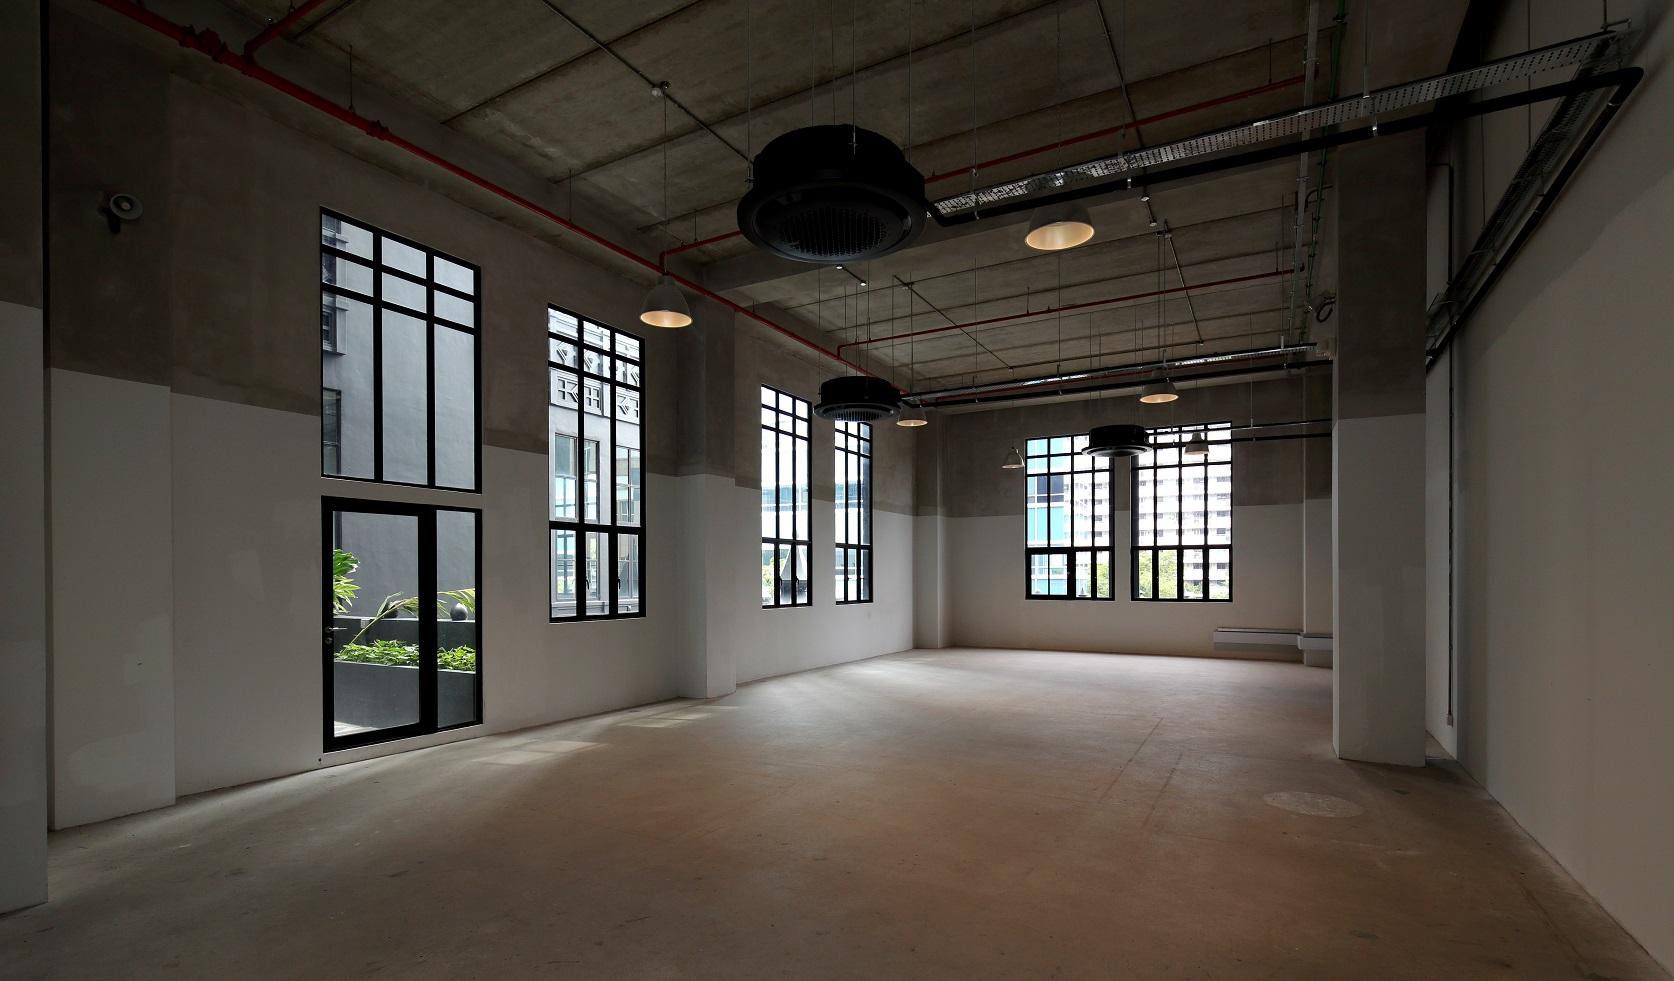 The Mill的典型办公单元有6米高的天花板和2.4米高的窗户。 第二层的单位已被批准用于餐饮(图片来源:Samuel Isaac Chua/Edgeprop Singapore)